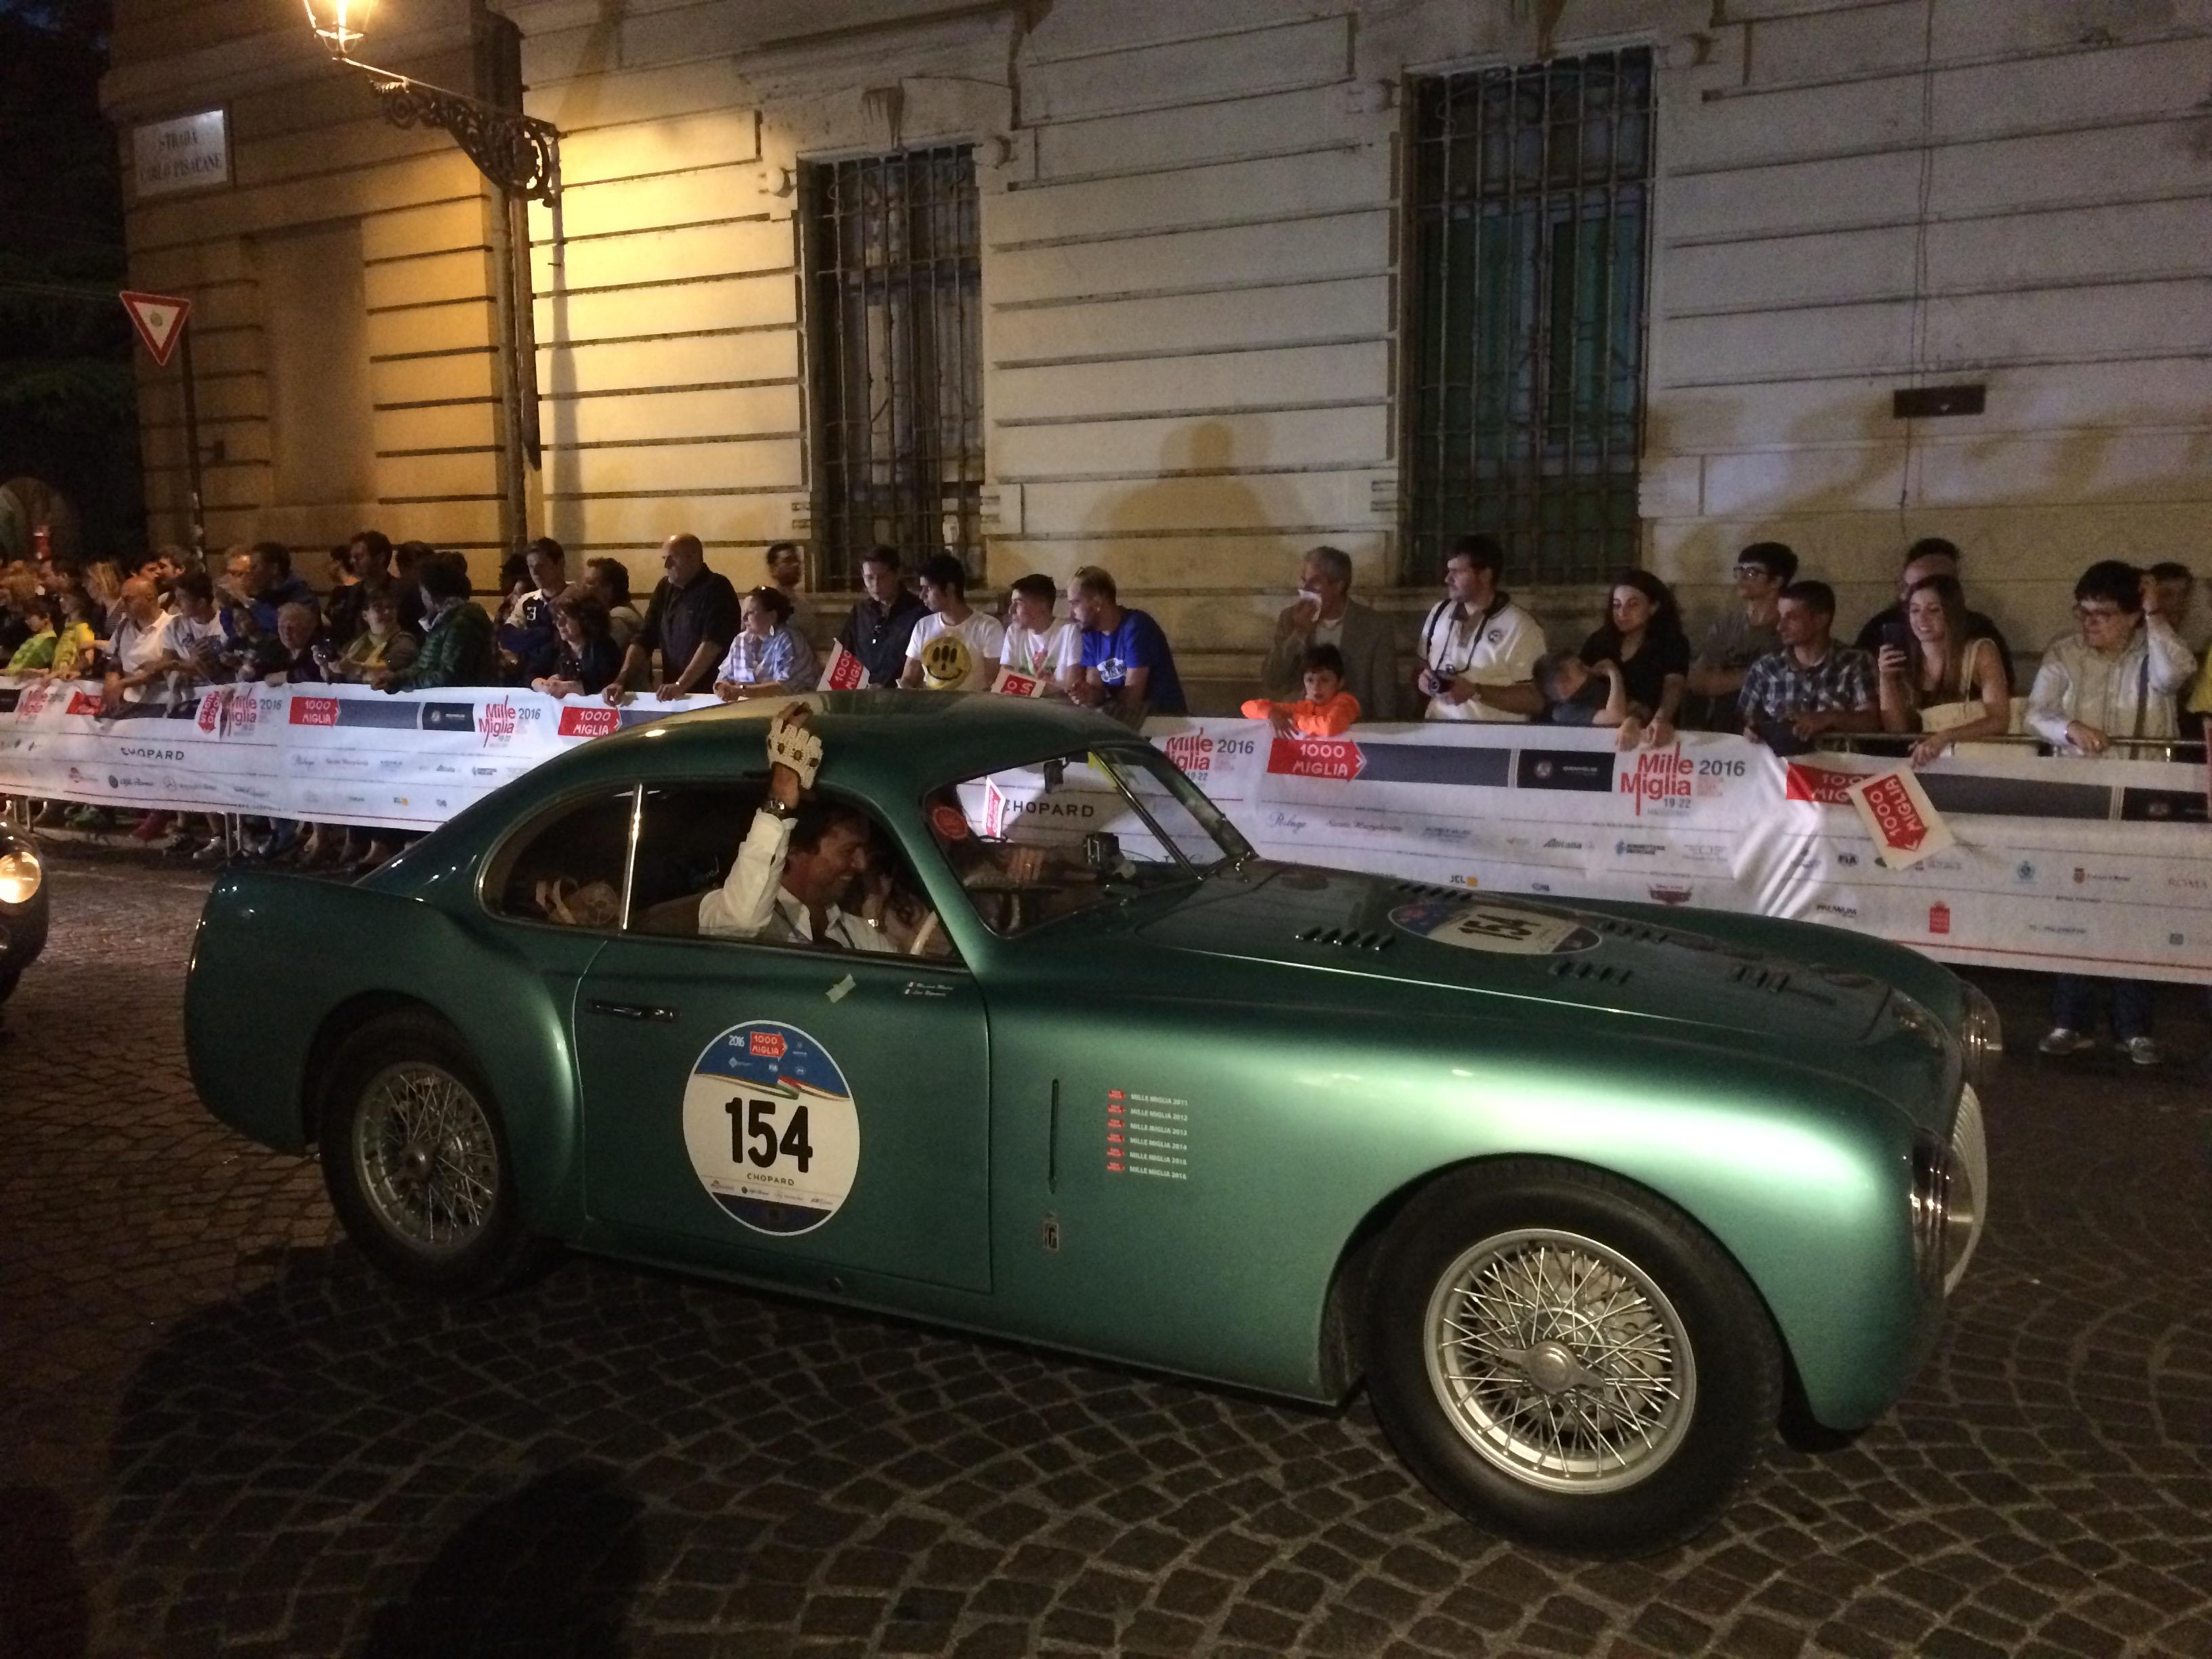 Mille Miglia veteranbilar kör in i Parma